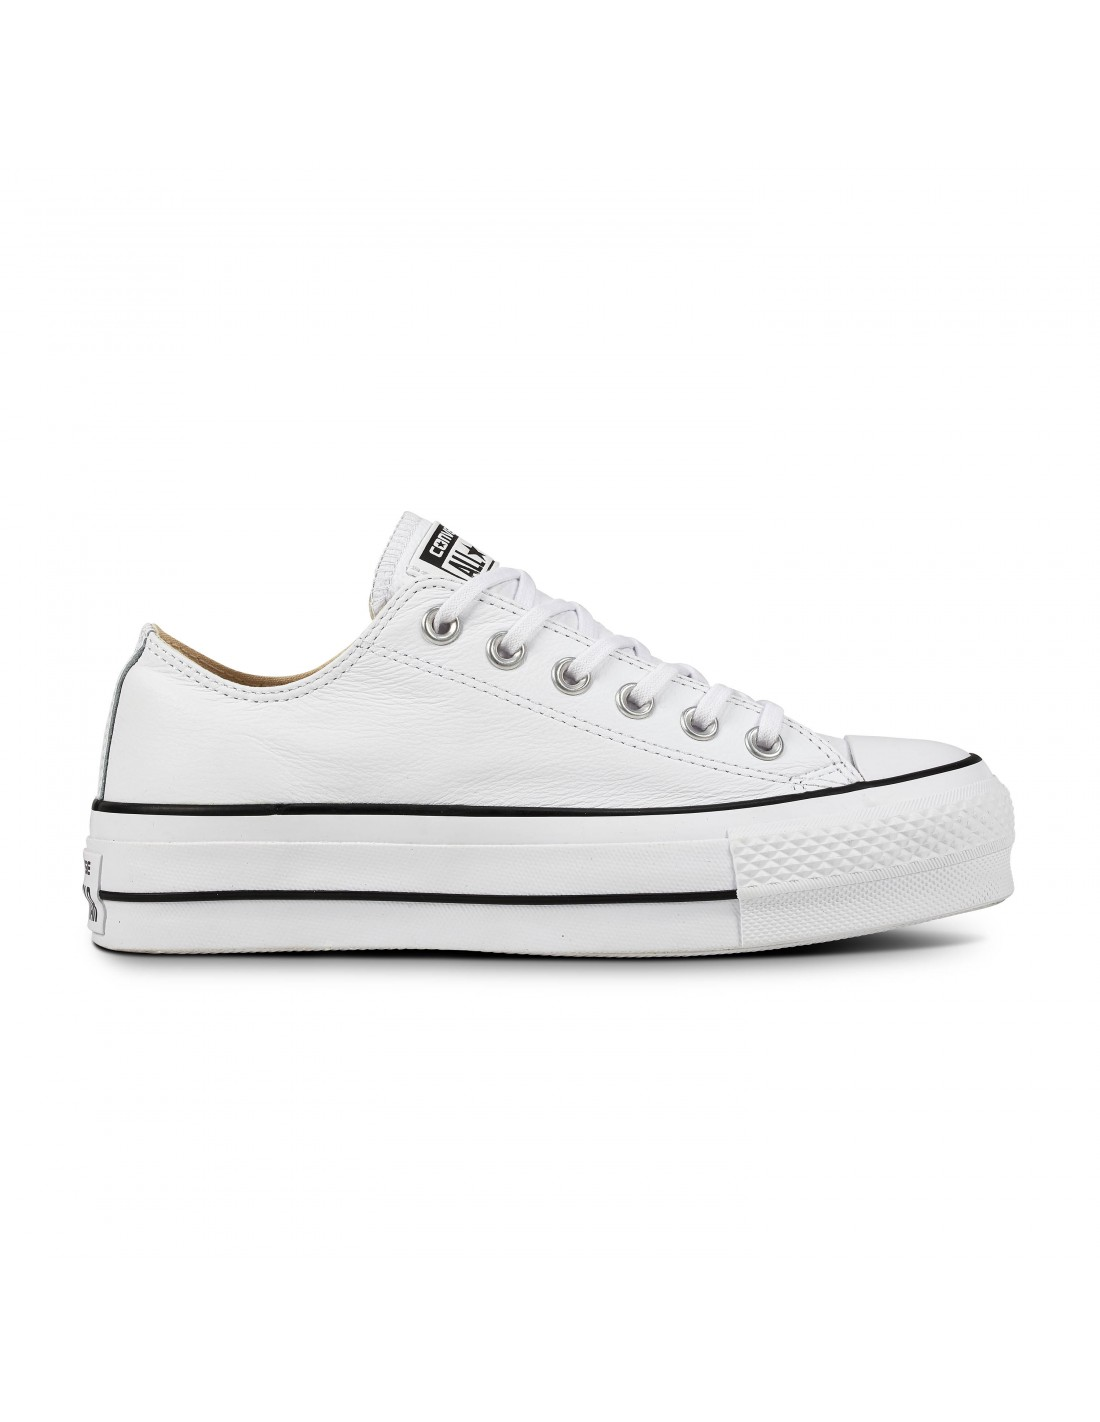 866605f54e2 ... Converse All Star Chuck Taylor Hi Λευκό Leather 136822C ...